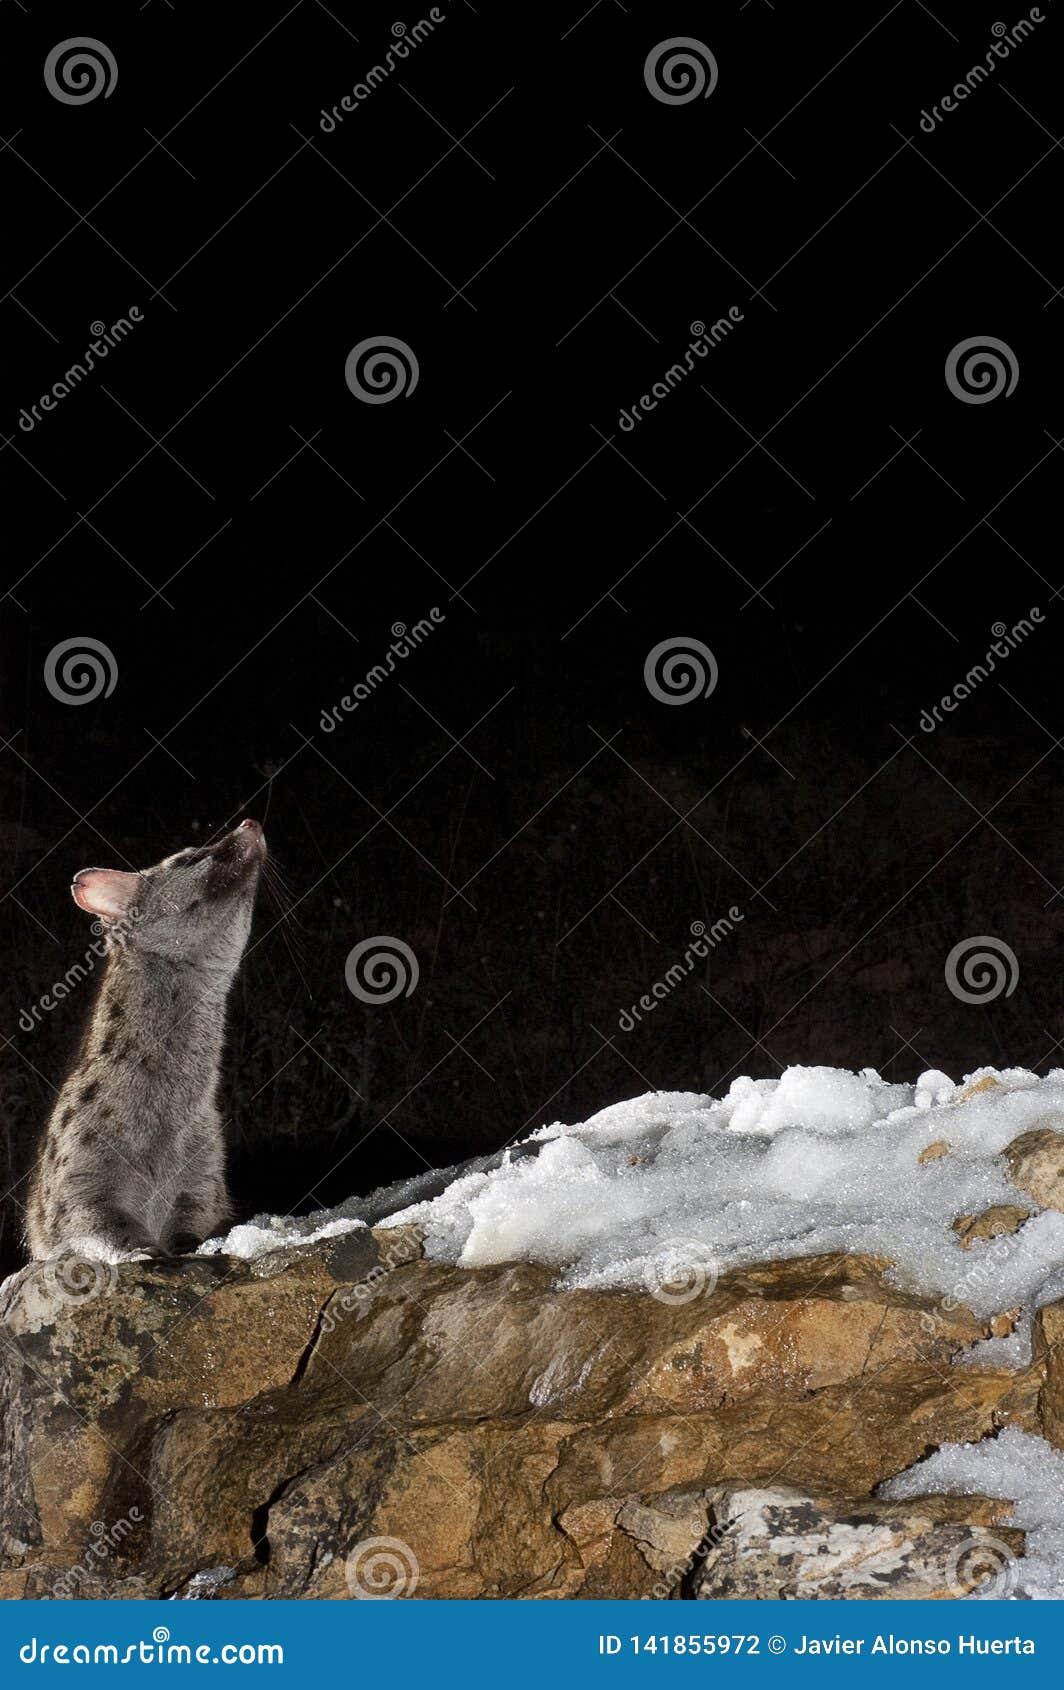 Common genet - Genetta genetta, on a rock with snow